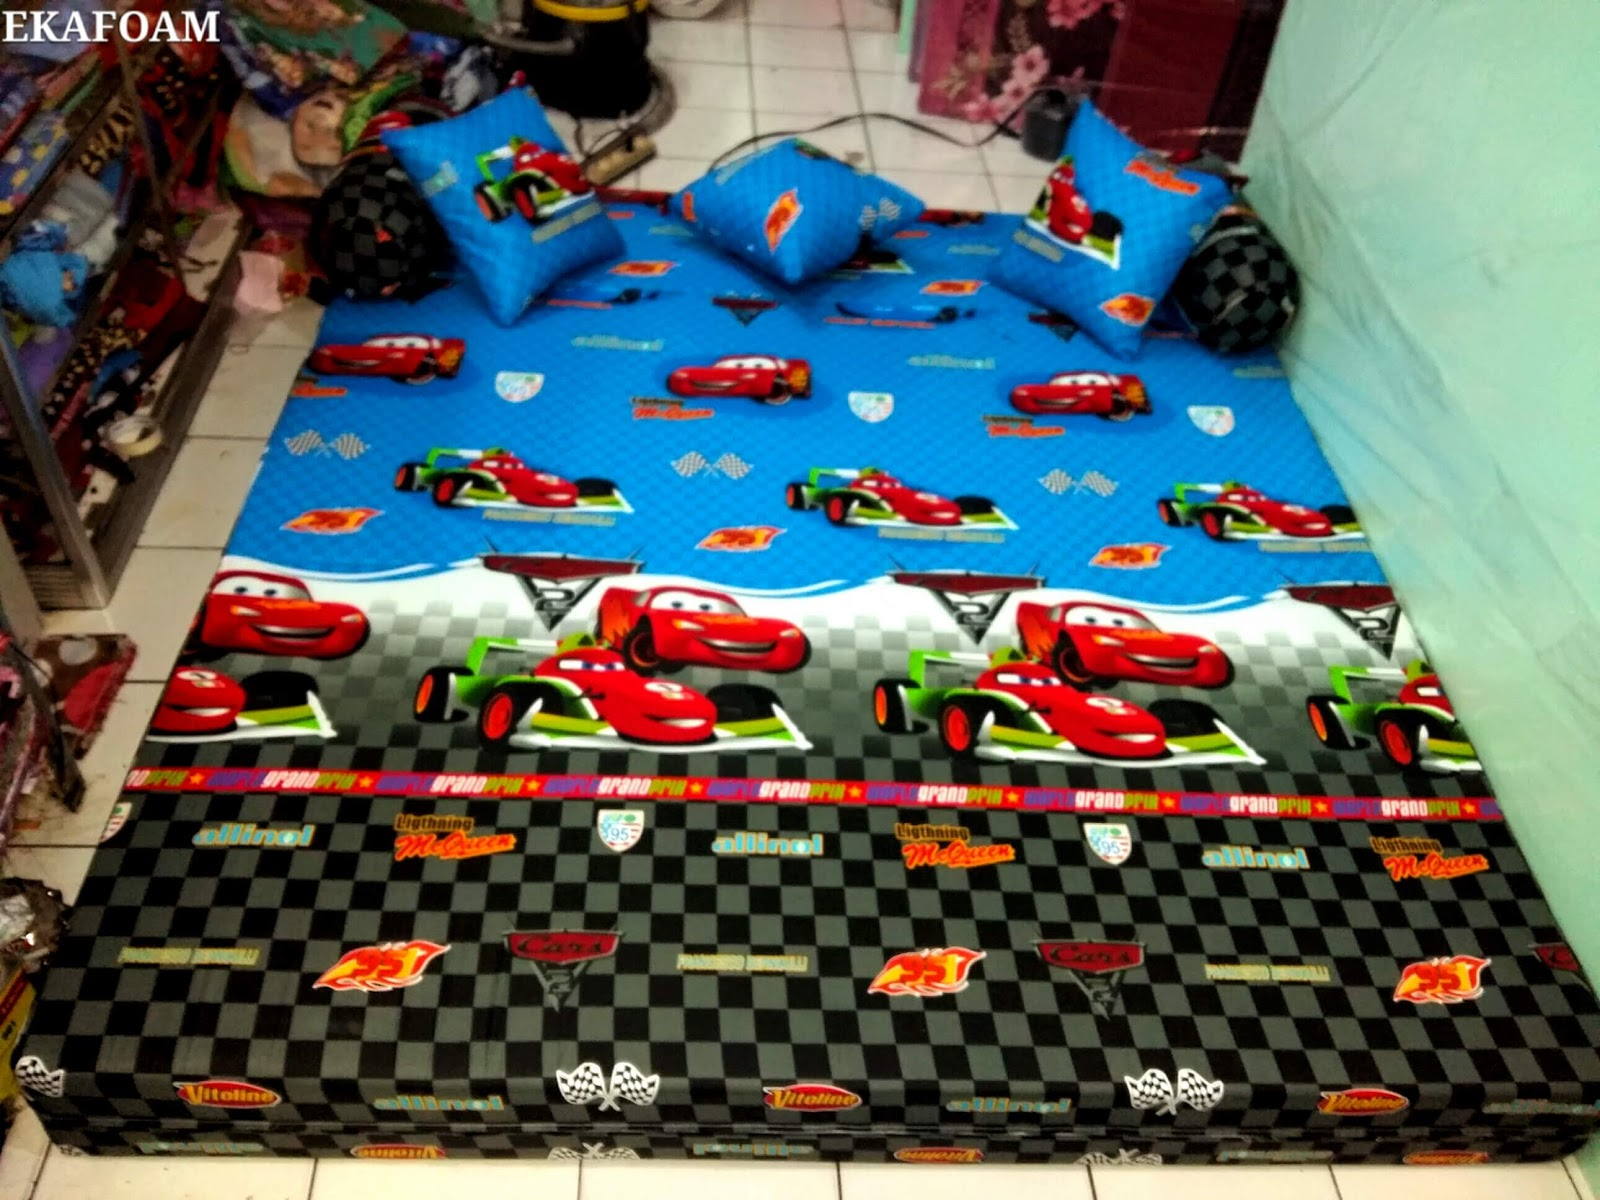 Harga Sofa Bed Inoac 2017 Crate And Barrel Lounge Sleeper Full Motif Agen Resmi Kasur Busa